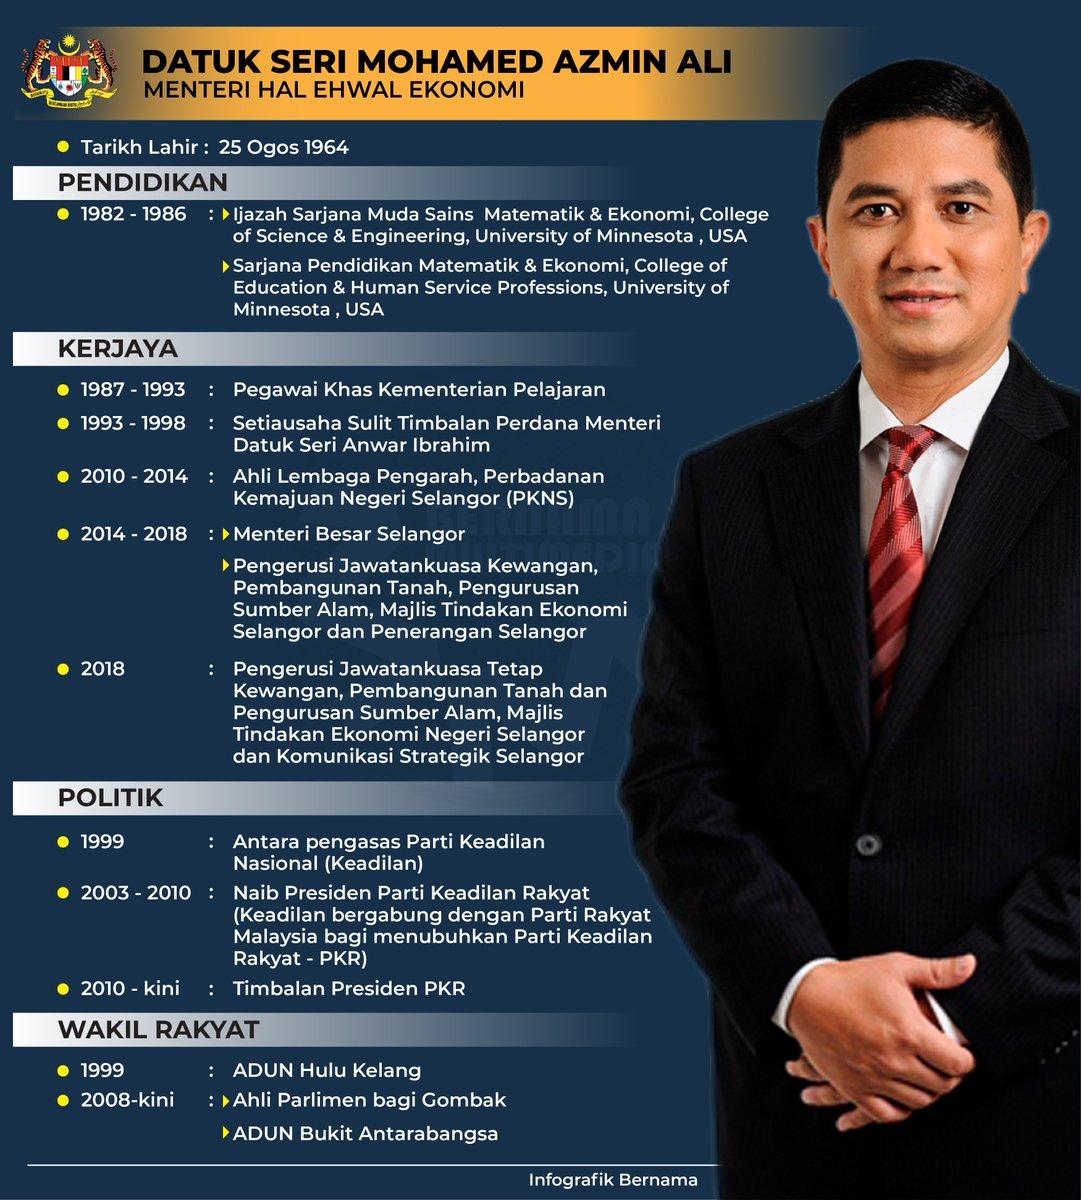 Bernama On Twitter Infografik Profil Menteri Hal Ehwal Ekonomi Azminali